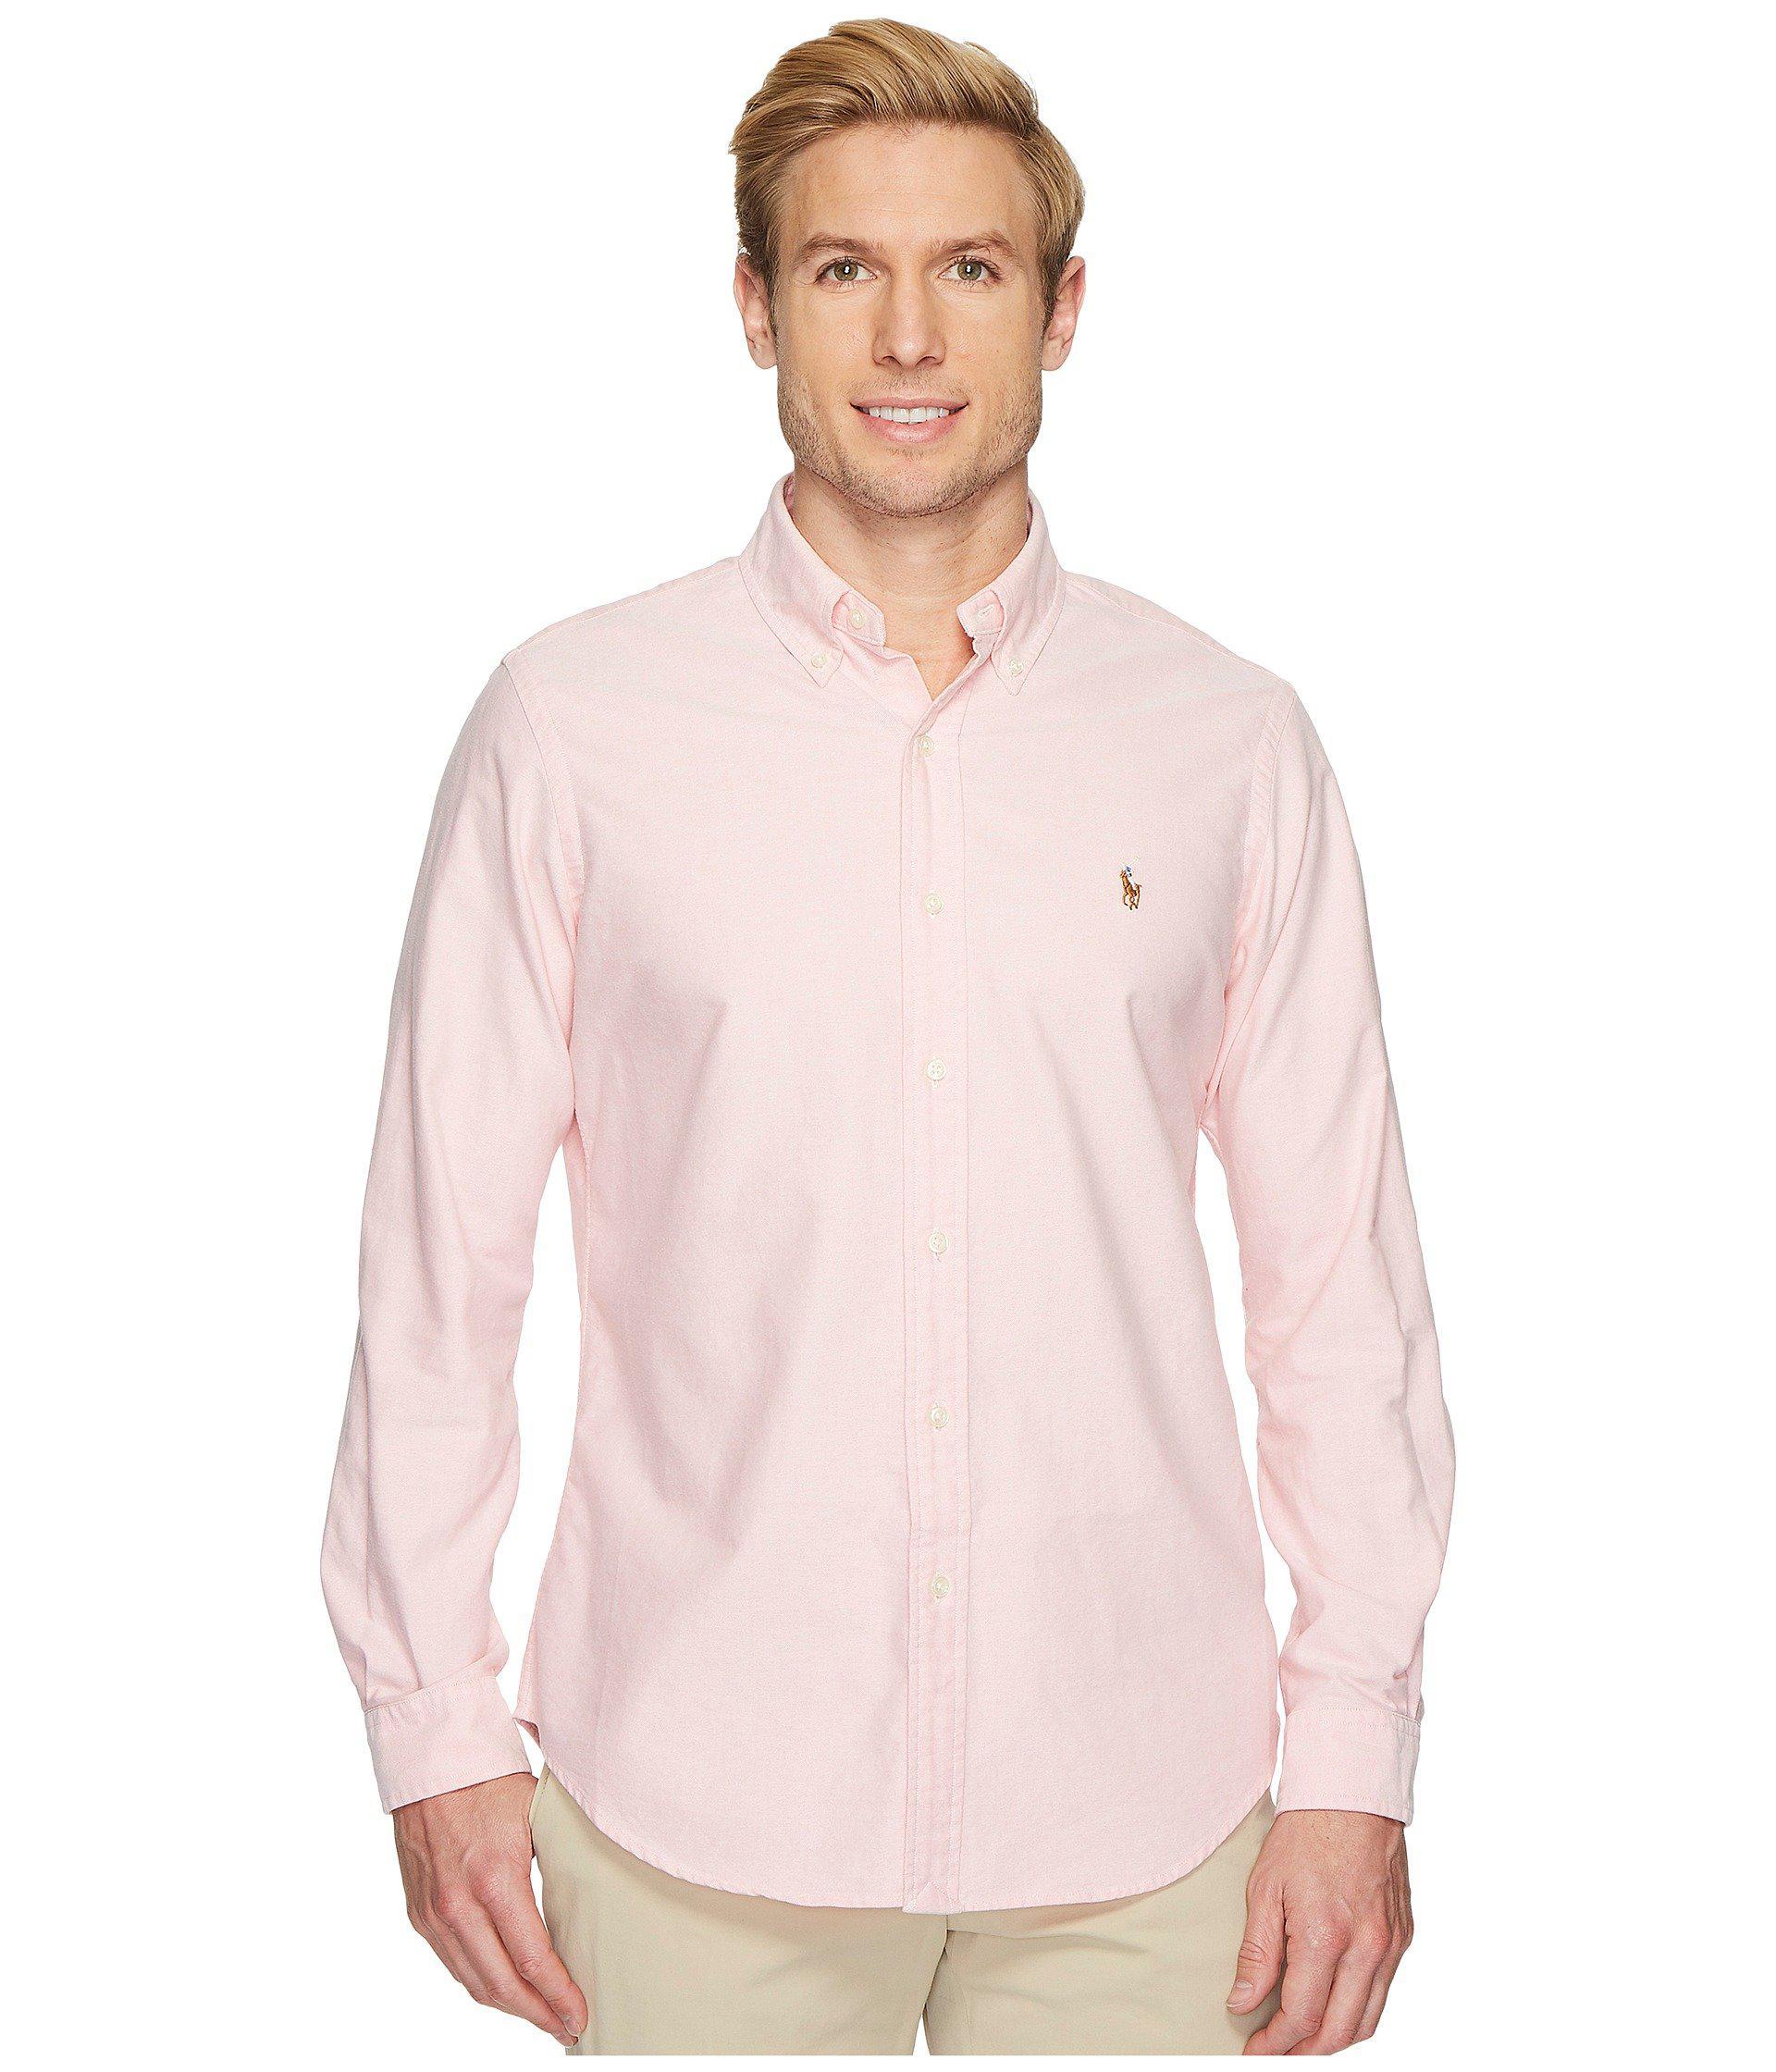 Lyst Polo Ralph Lauren Standard Fit Oxford Sport Shirt White